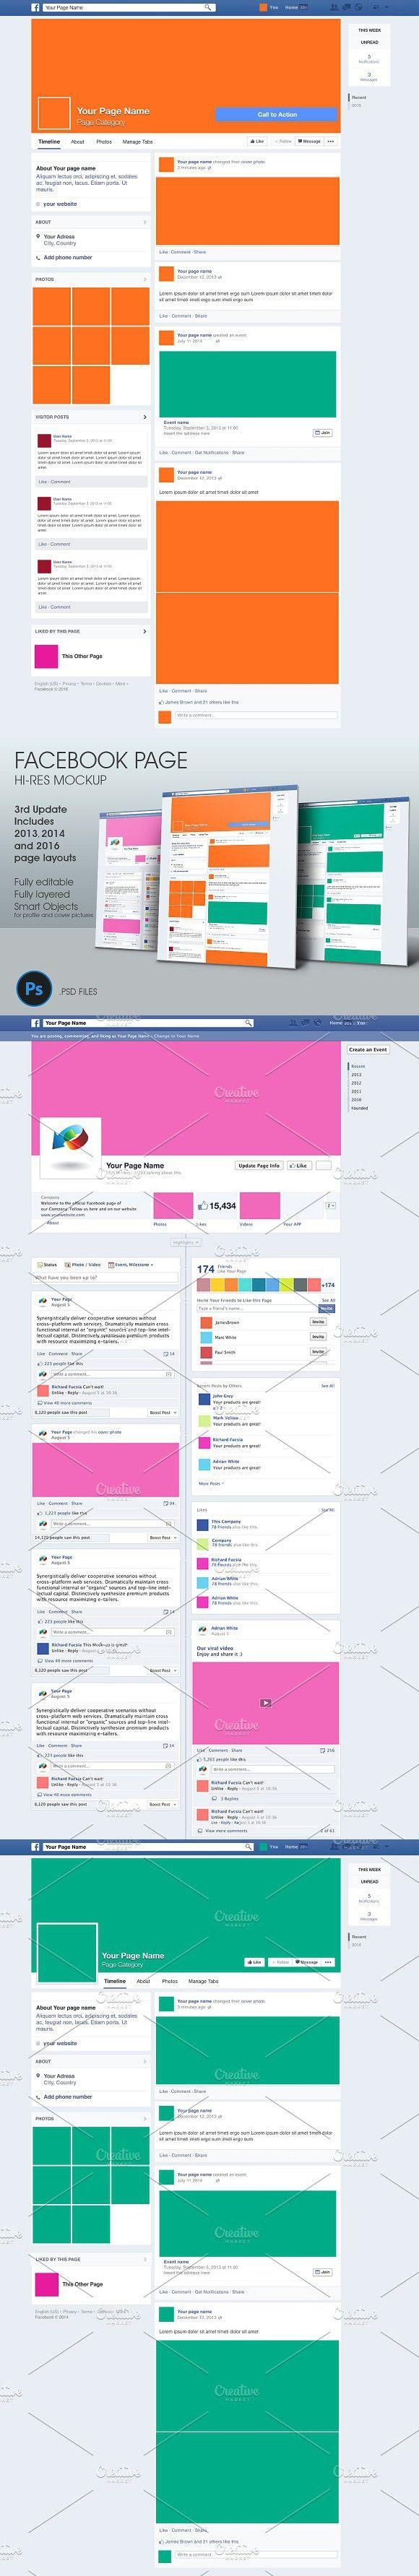 facebook page hi res mockup mockup templates pinterest mockup